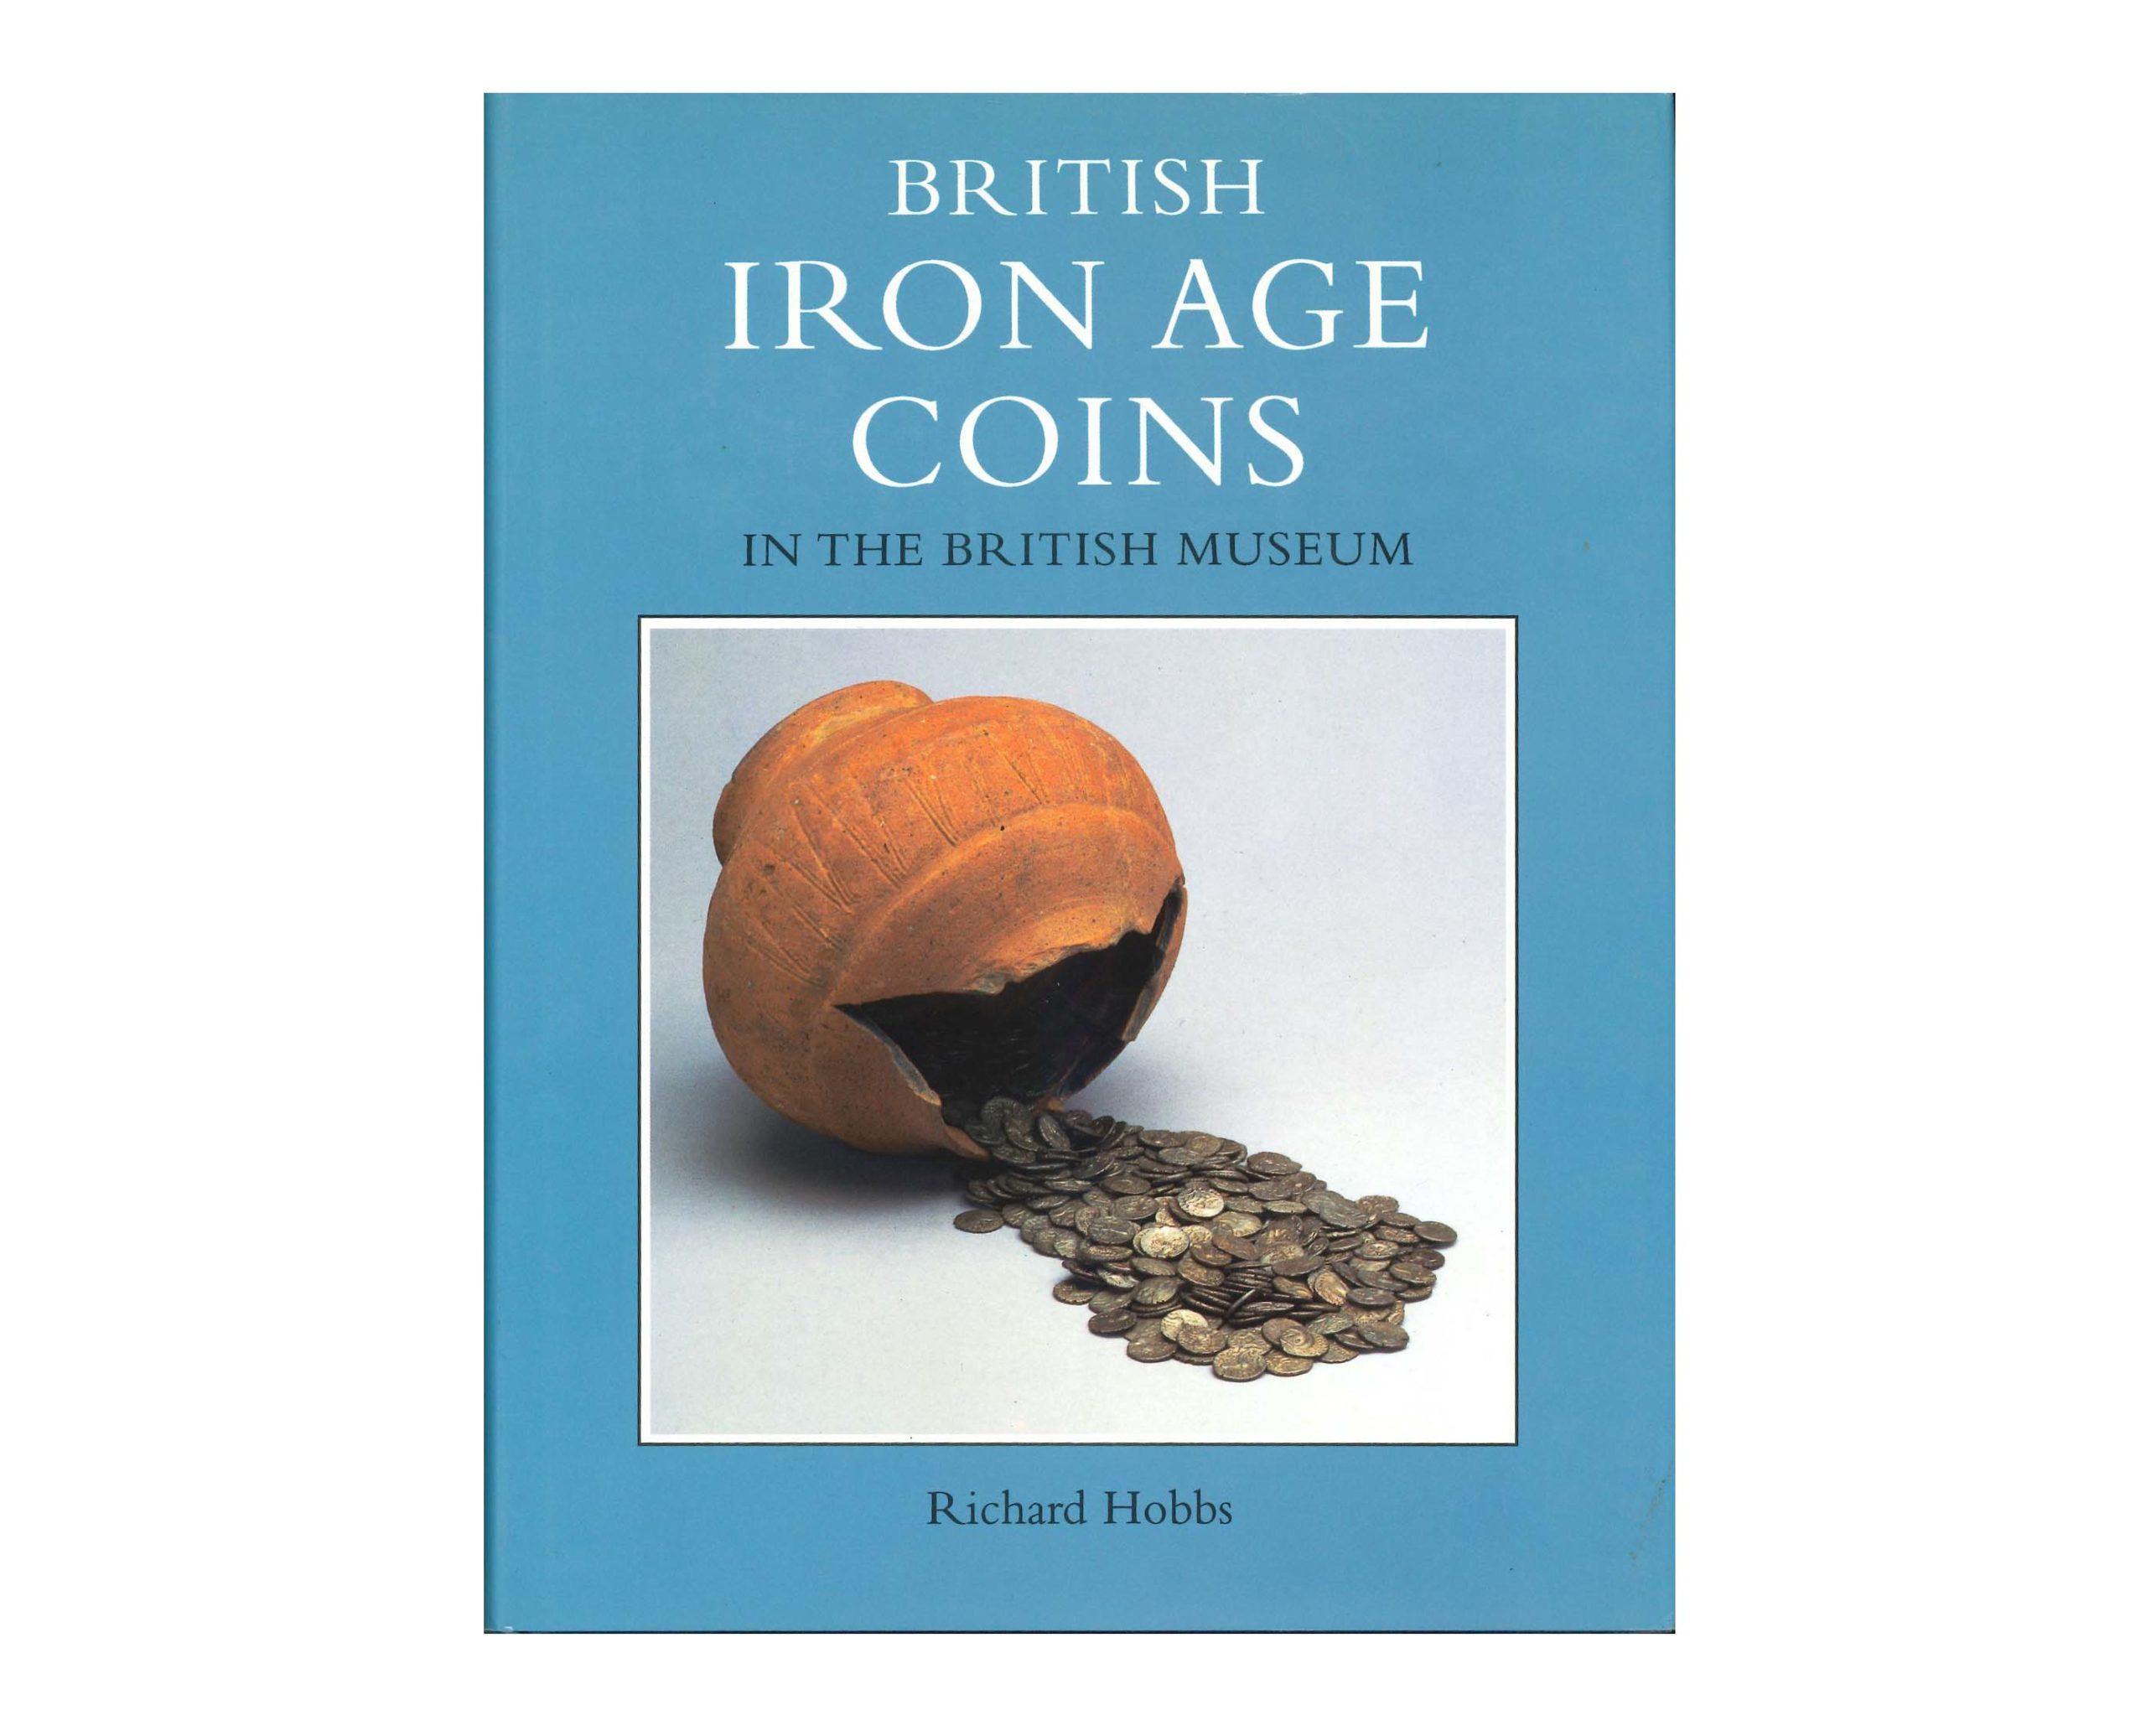 British Iron Age Coins in the British Museum